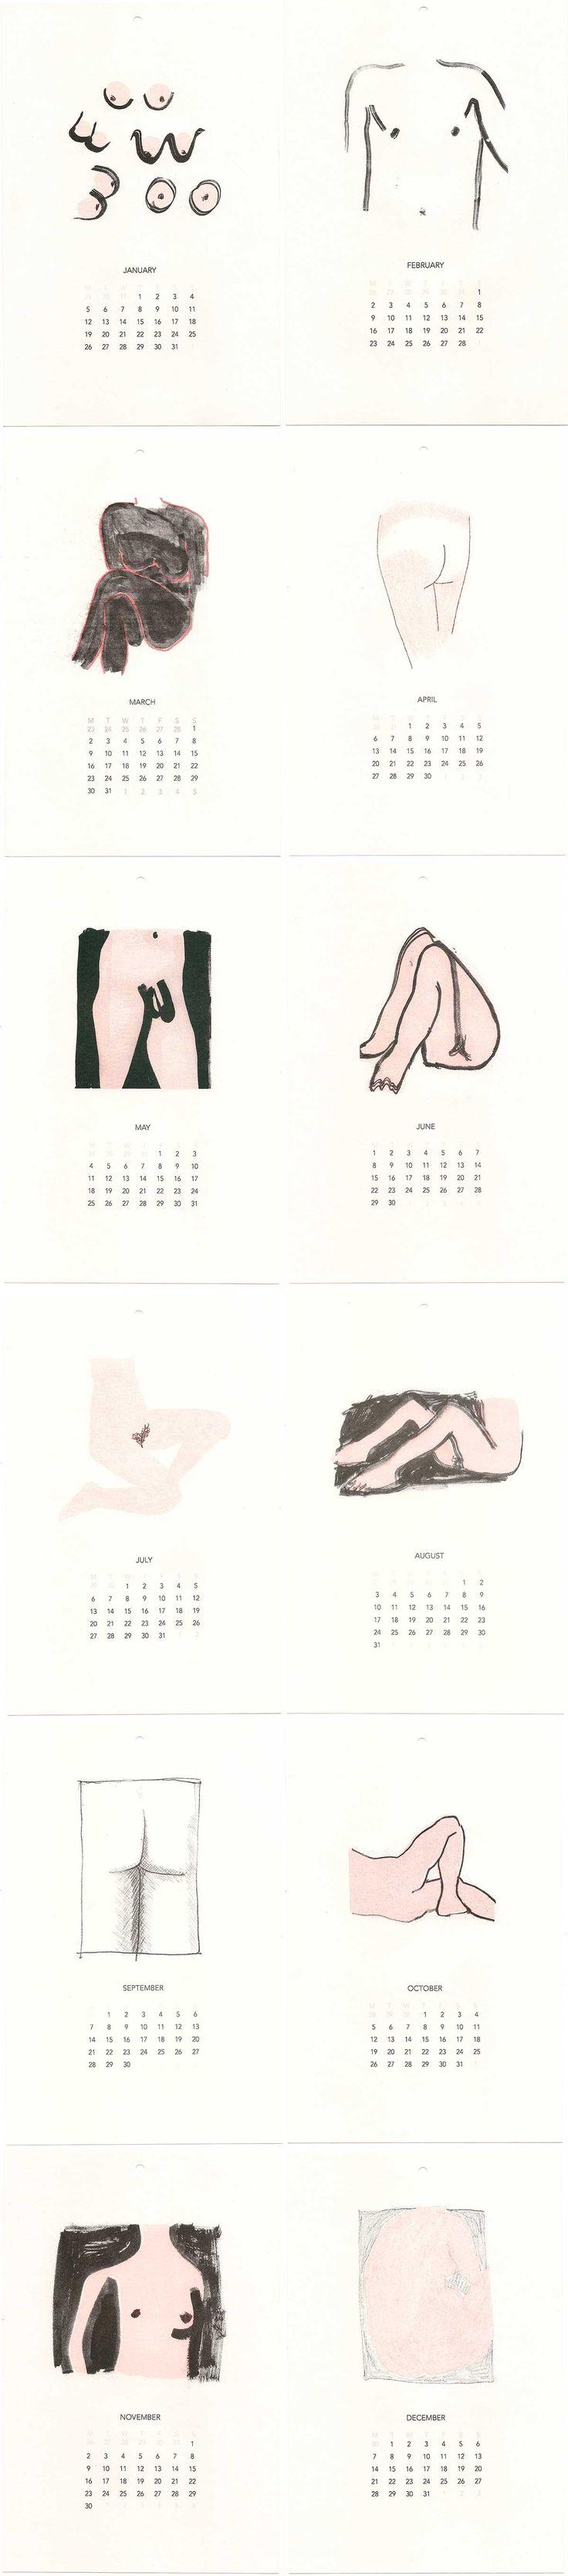 Illustrated Nudie Calendar by Anna Gleeson